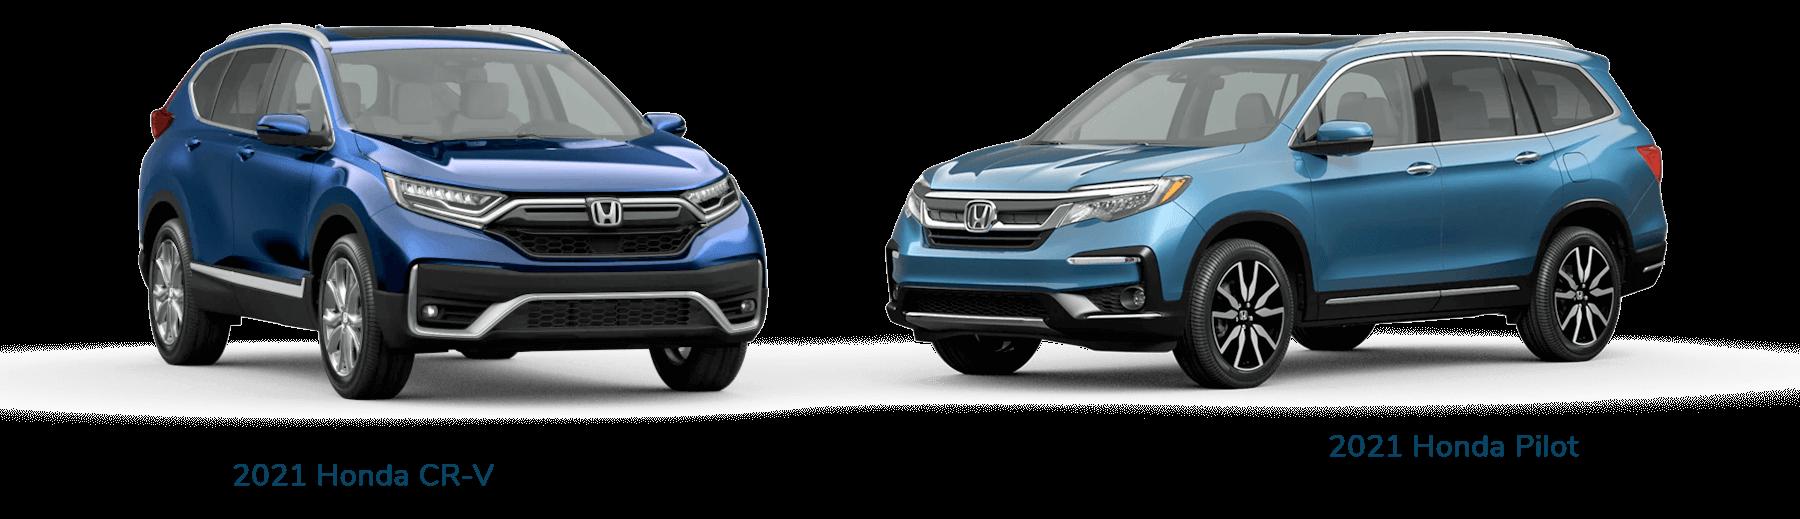 2021 Honda CR-V vs. 2021 Honda Pilot Jellybean